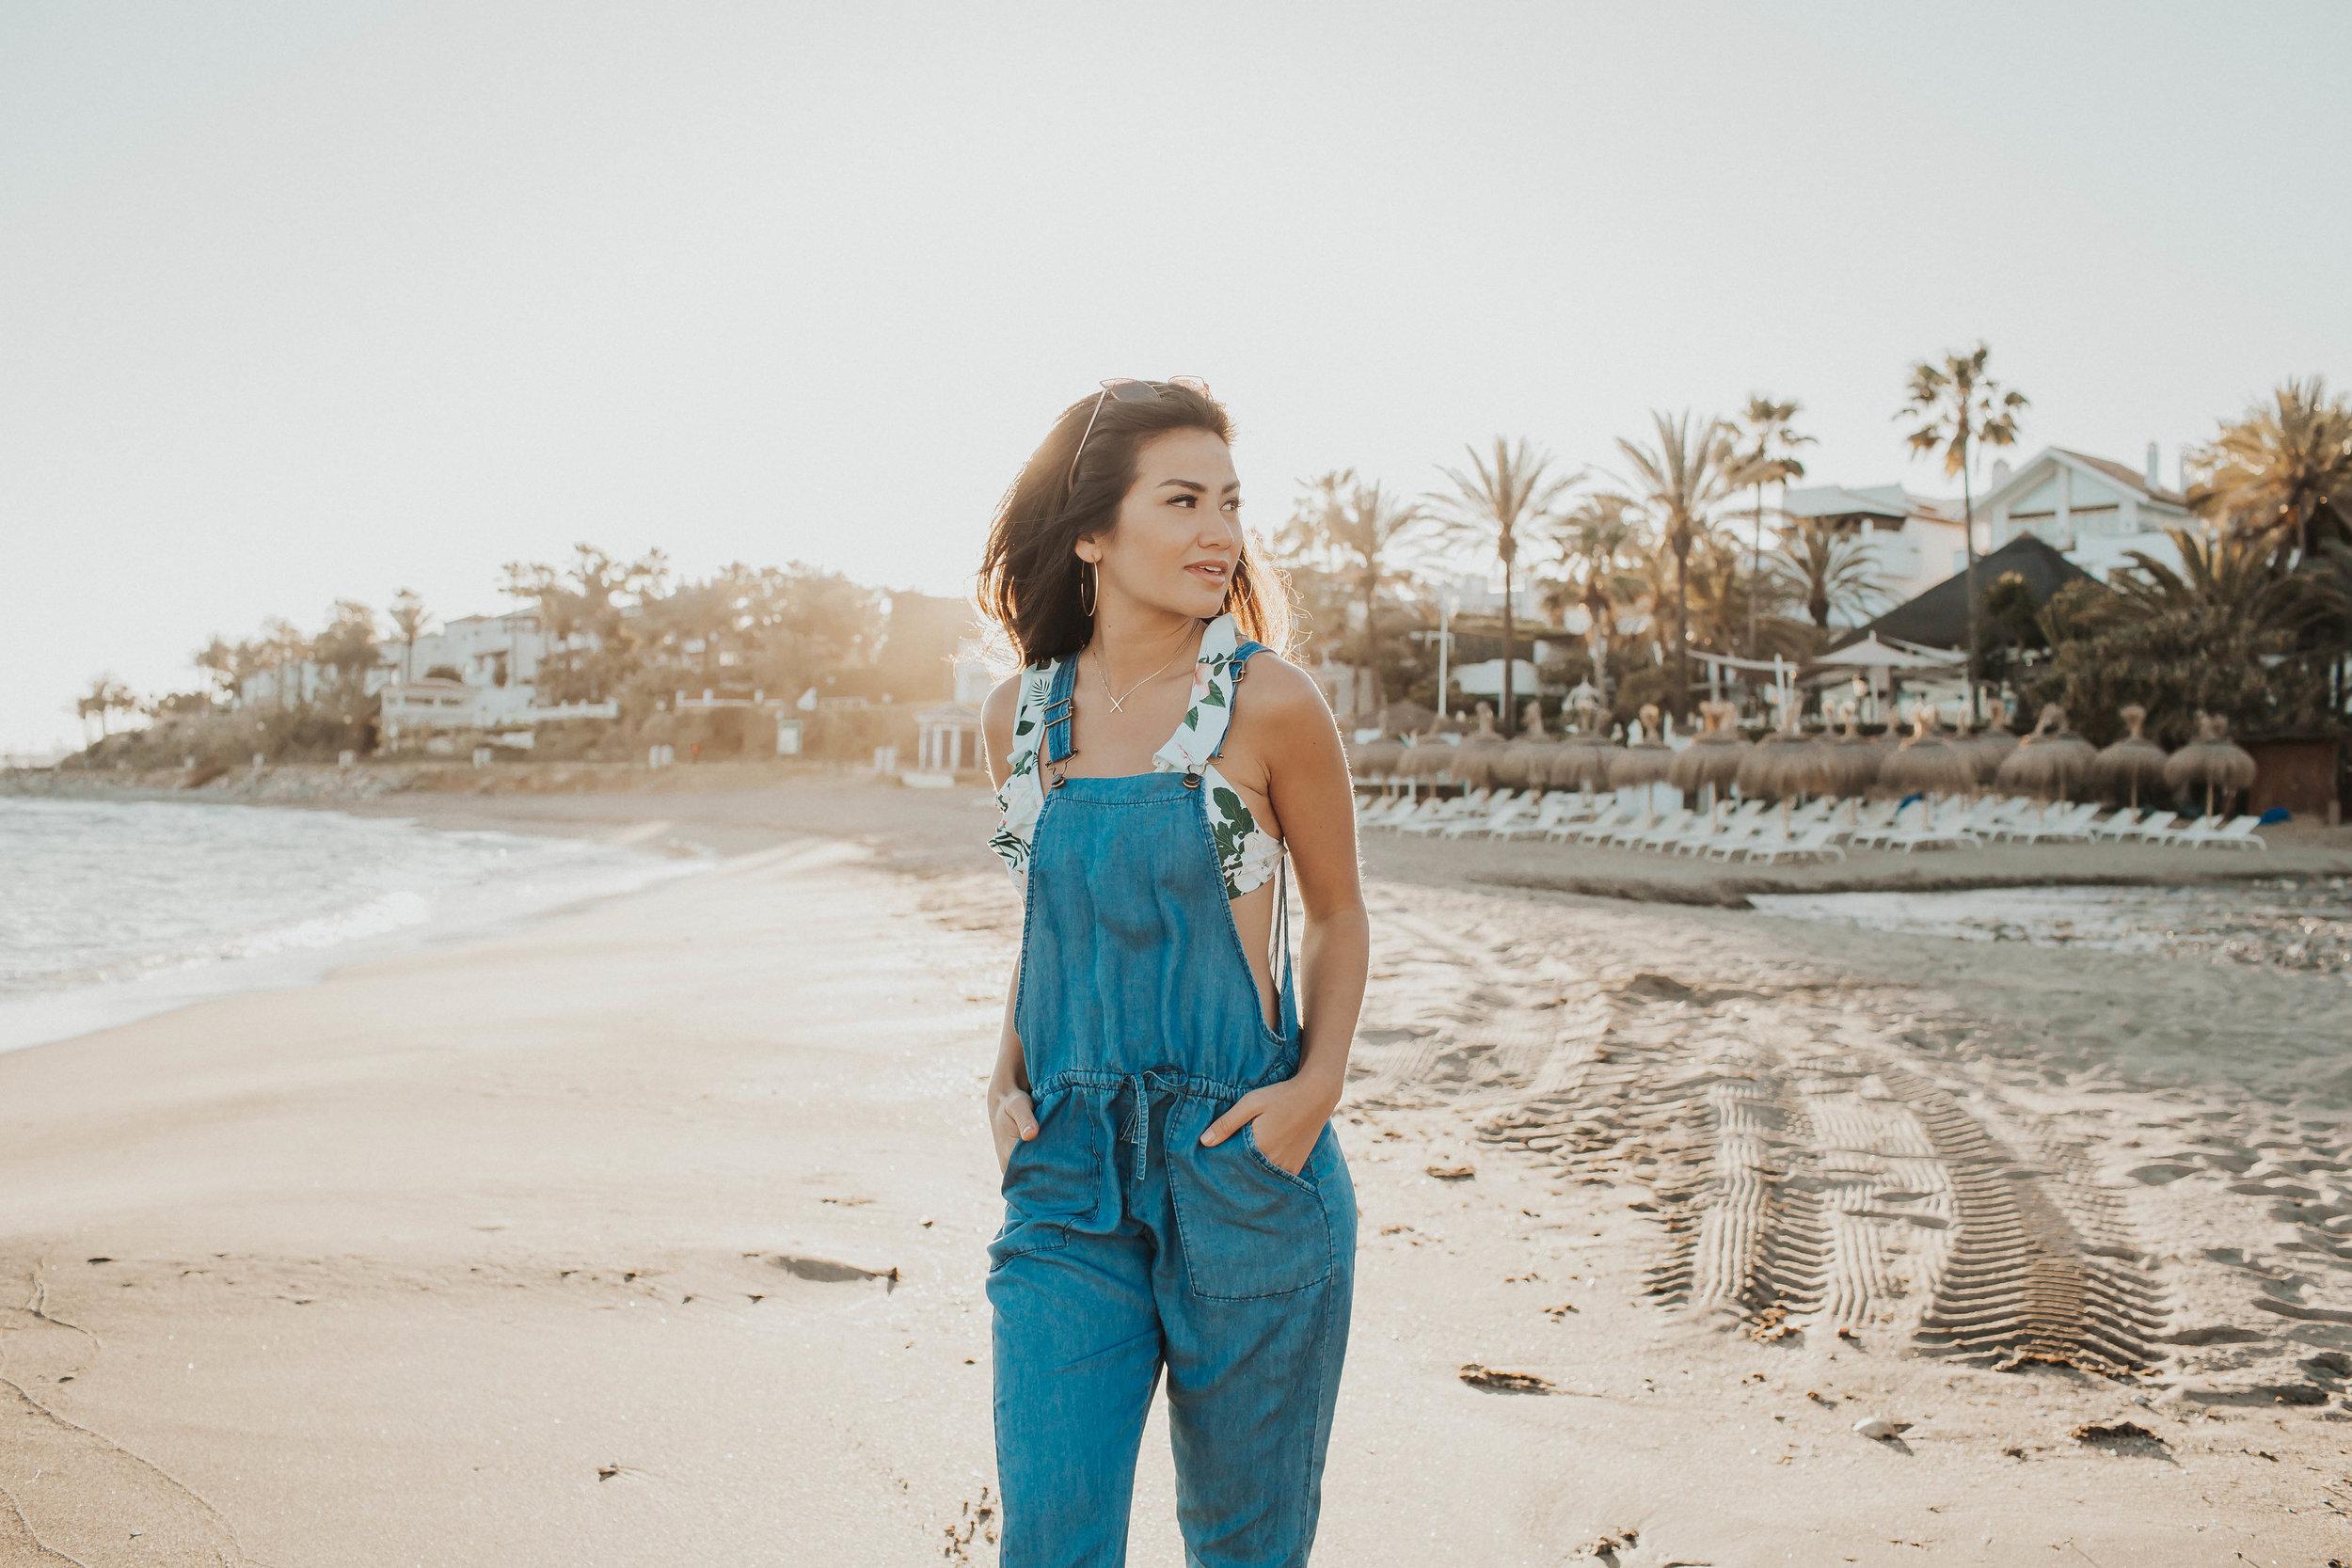 Caila Quinn at Nobu Hotel in Marbella, Spain